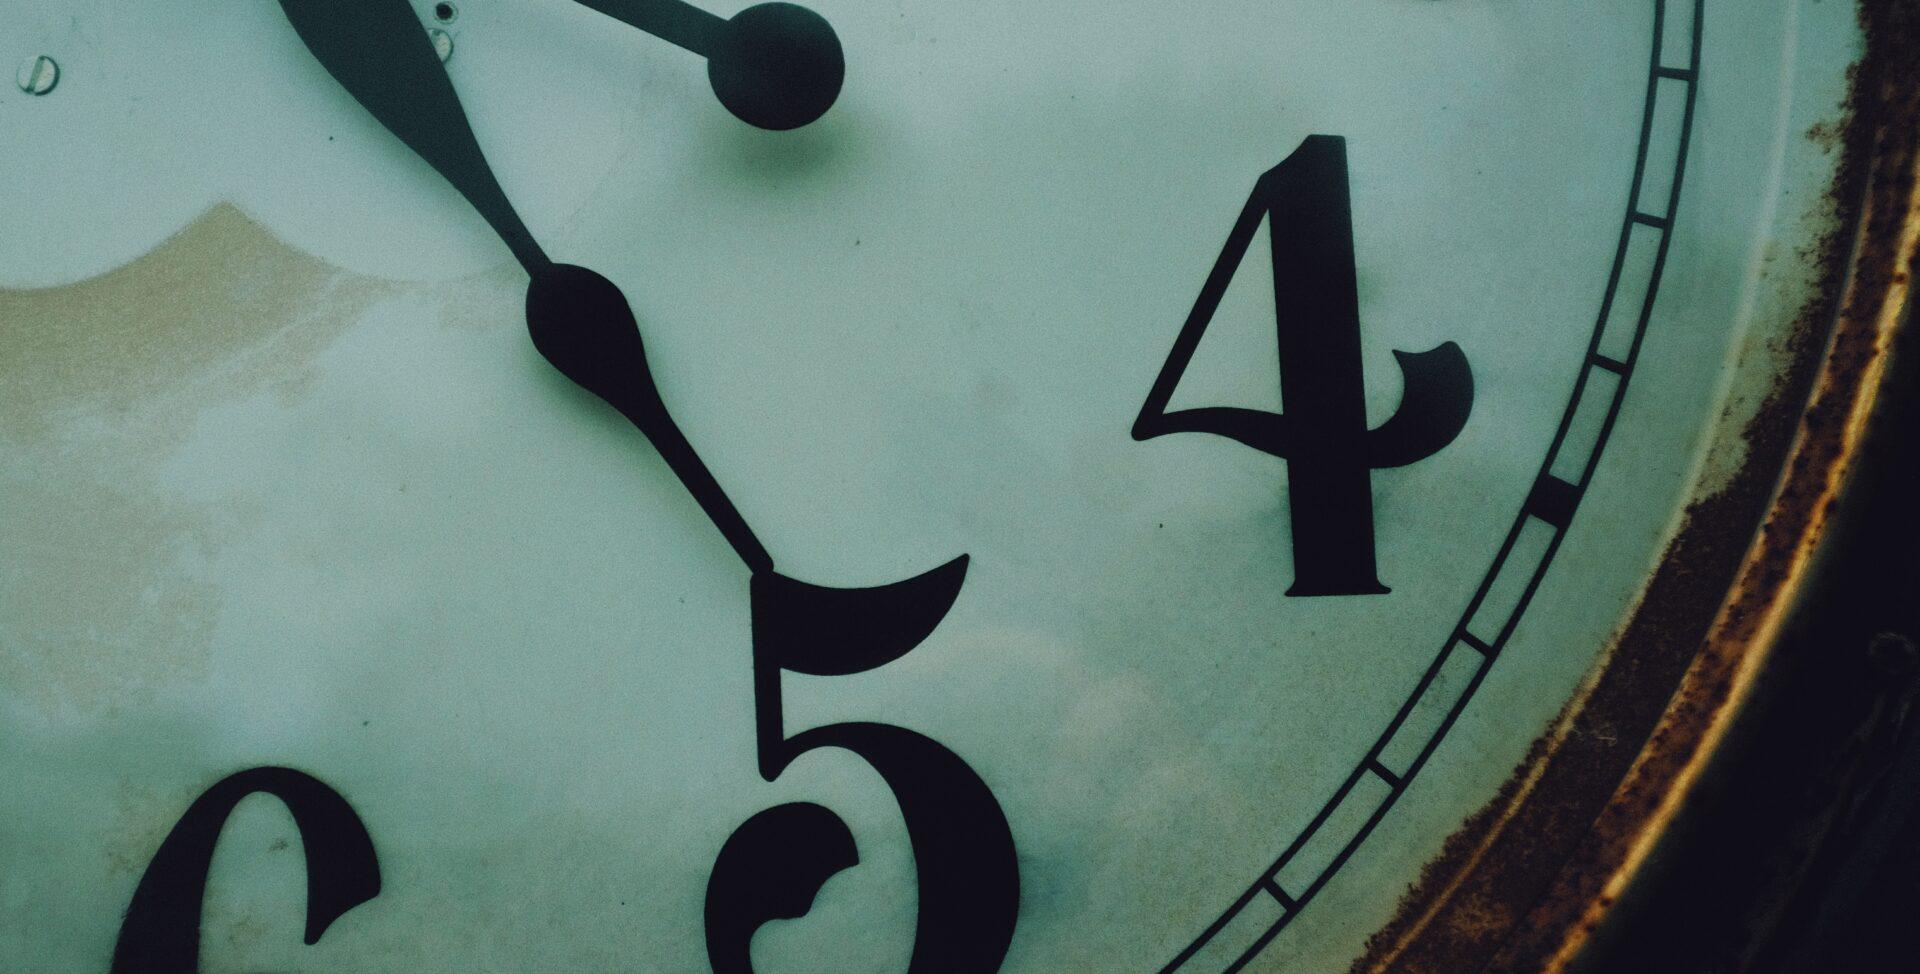 close up of an old clock